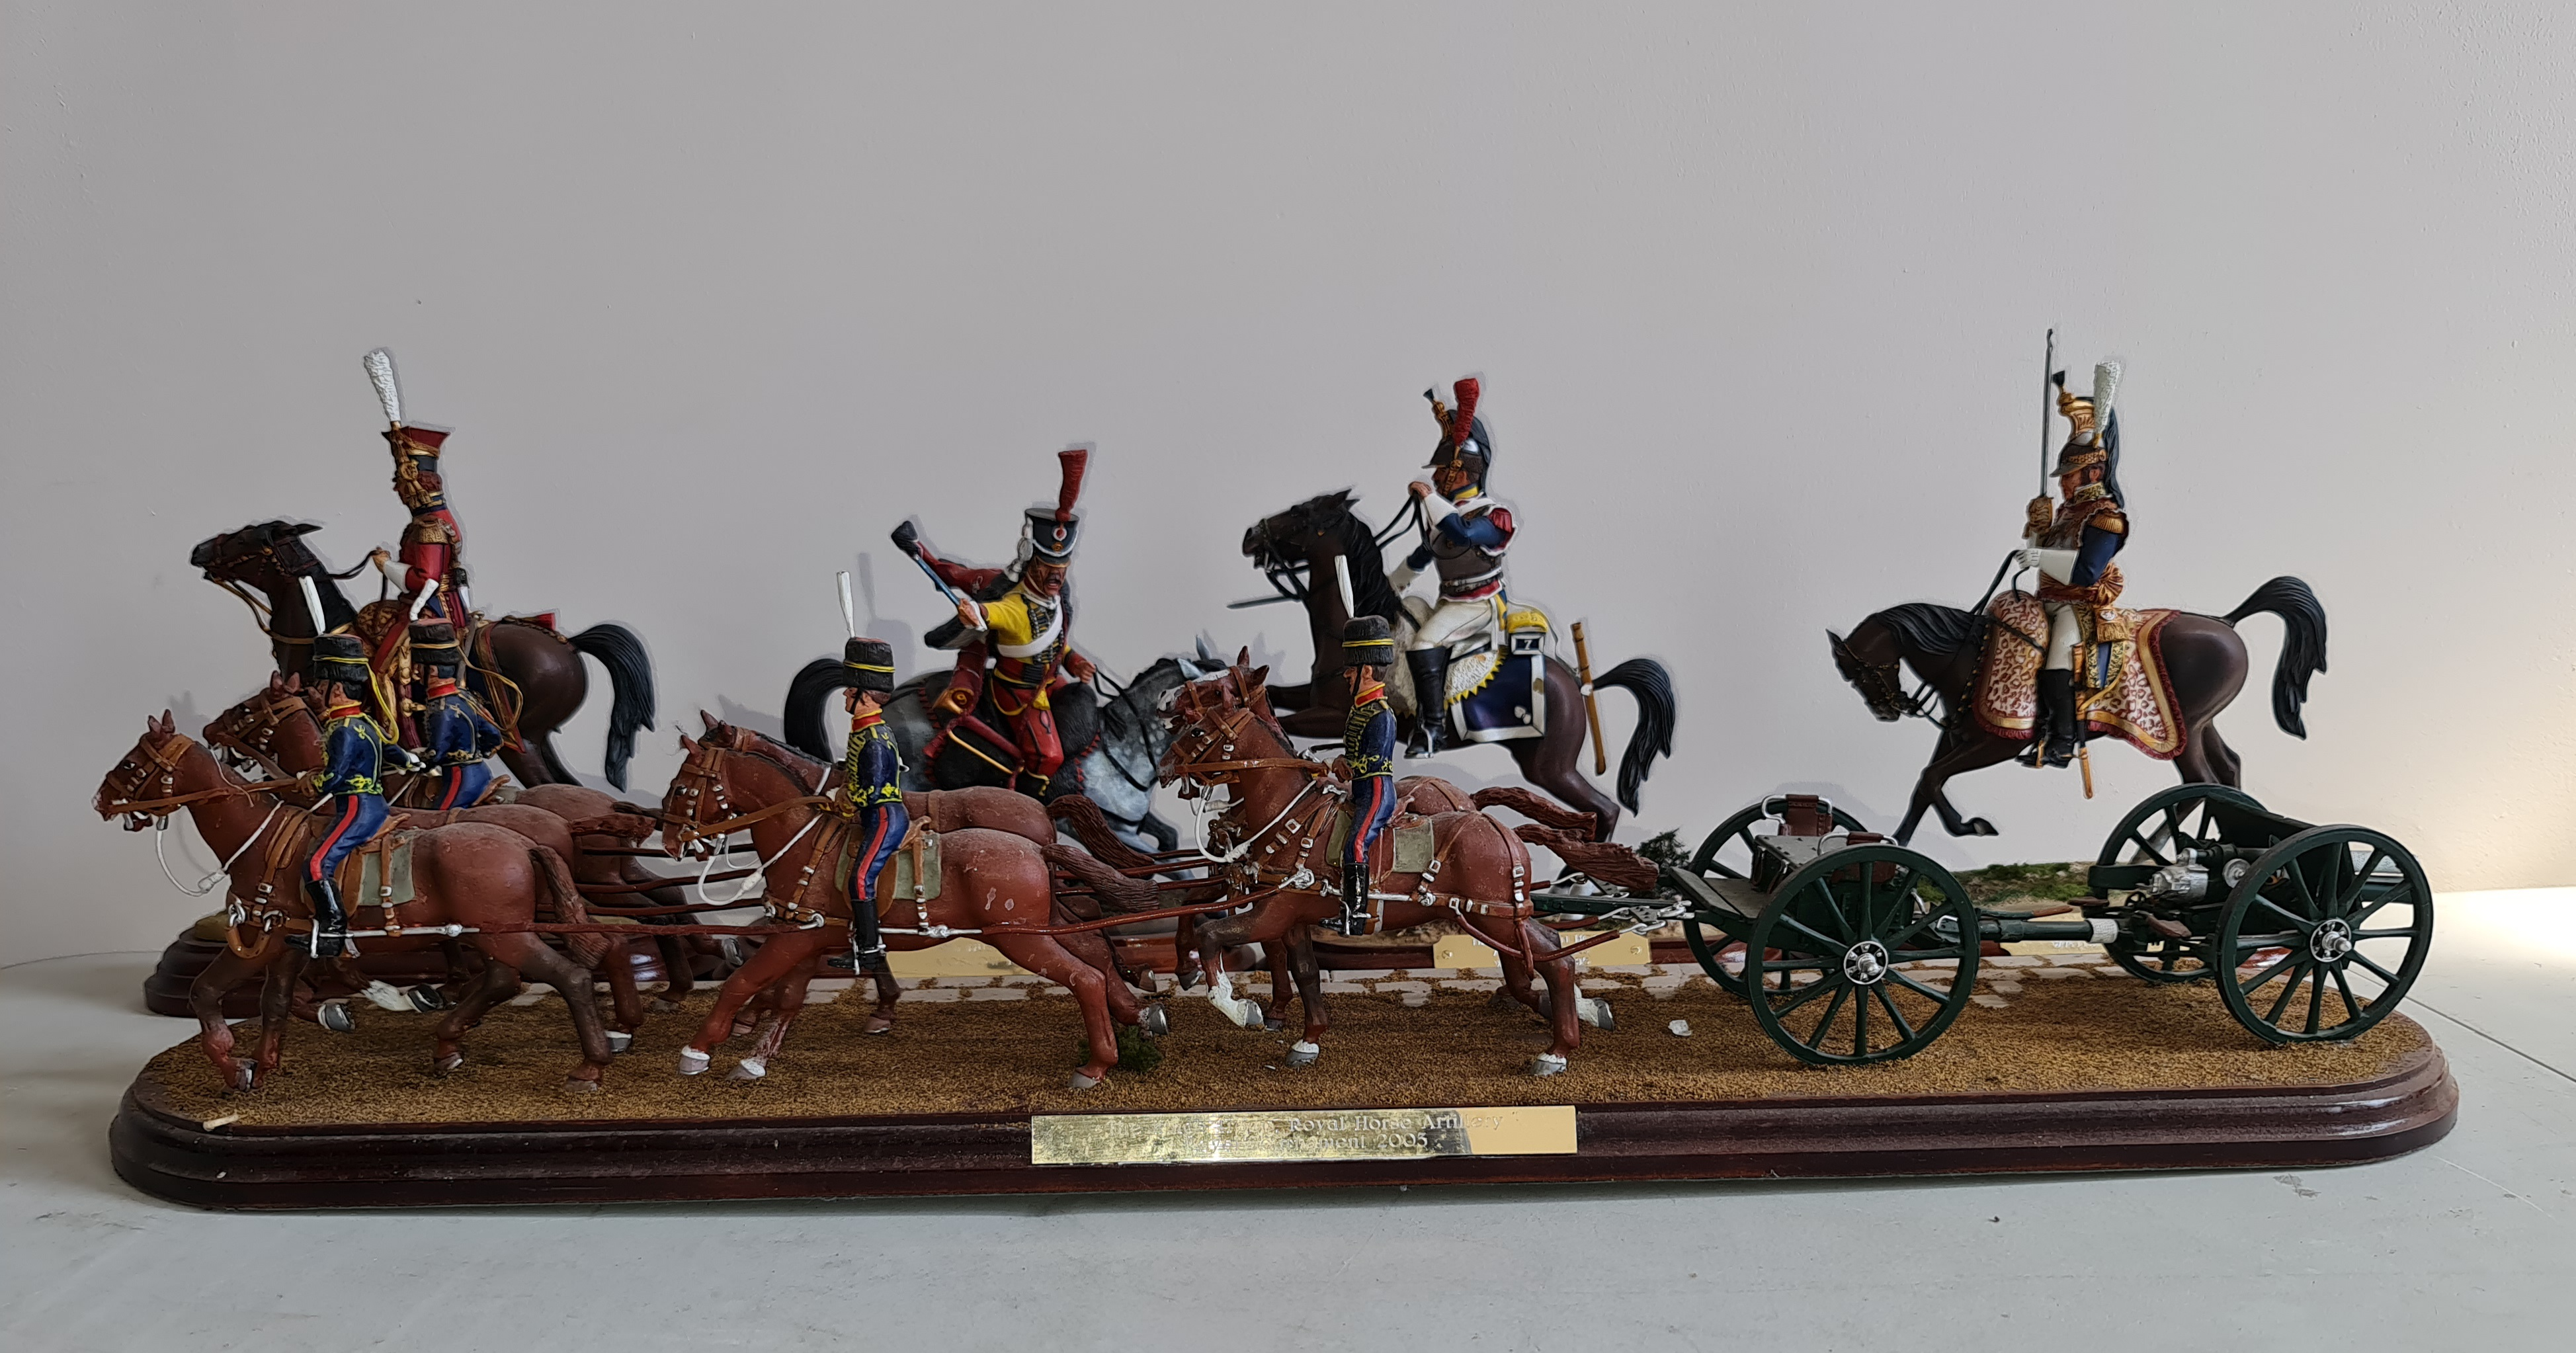 A handpainted metal figure group mounted on wood, 'The Kings Troop, Royal Horse Artillery, Royal